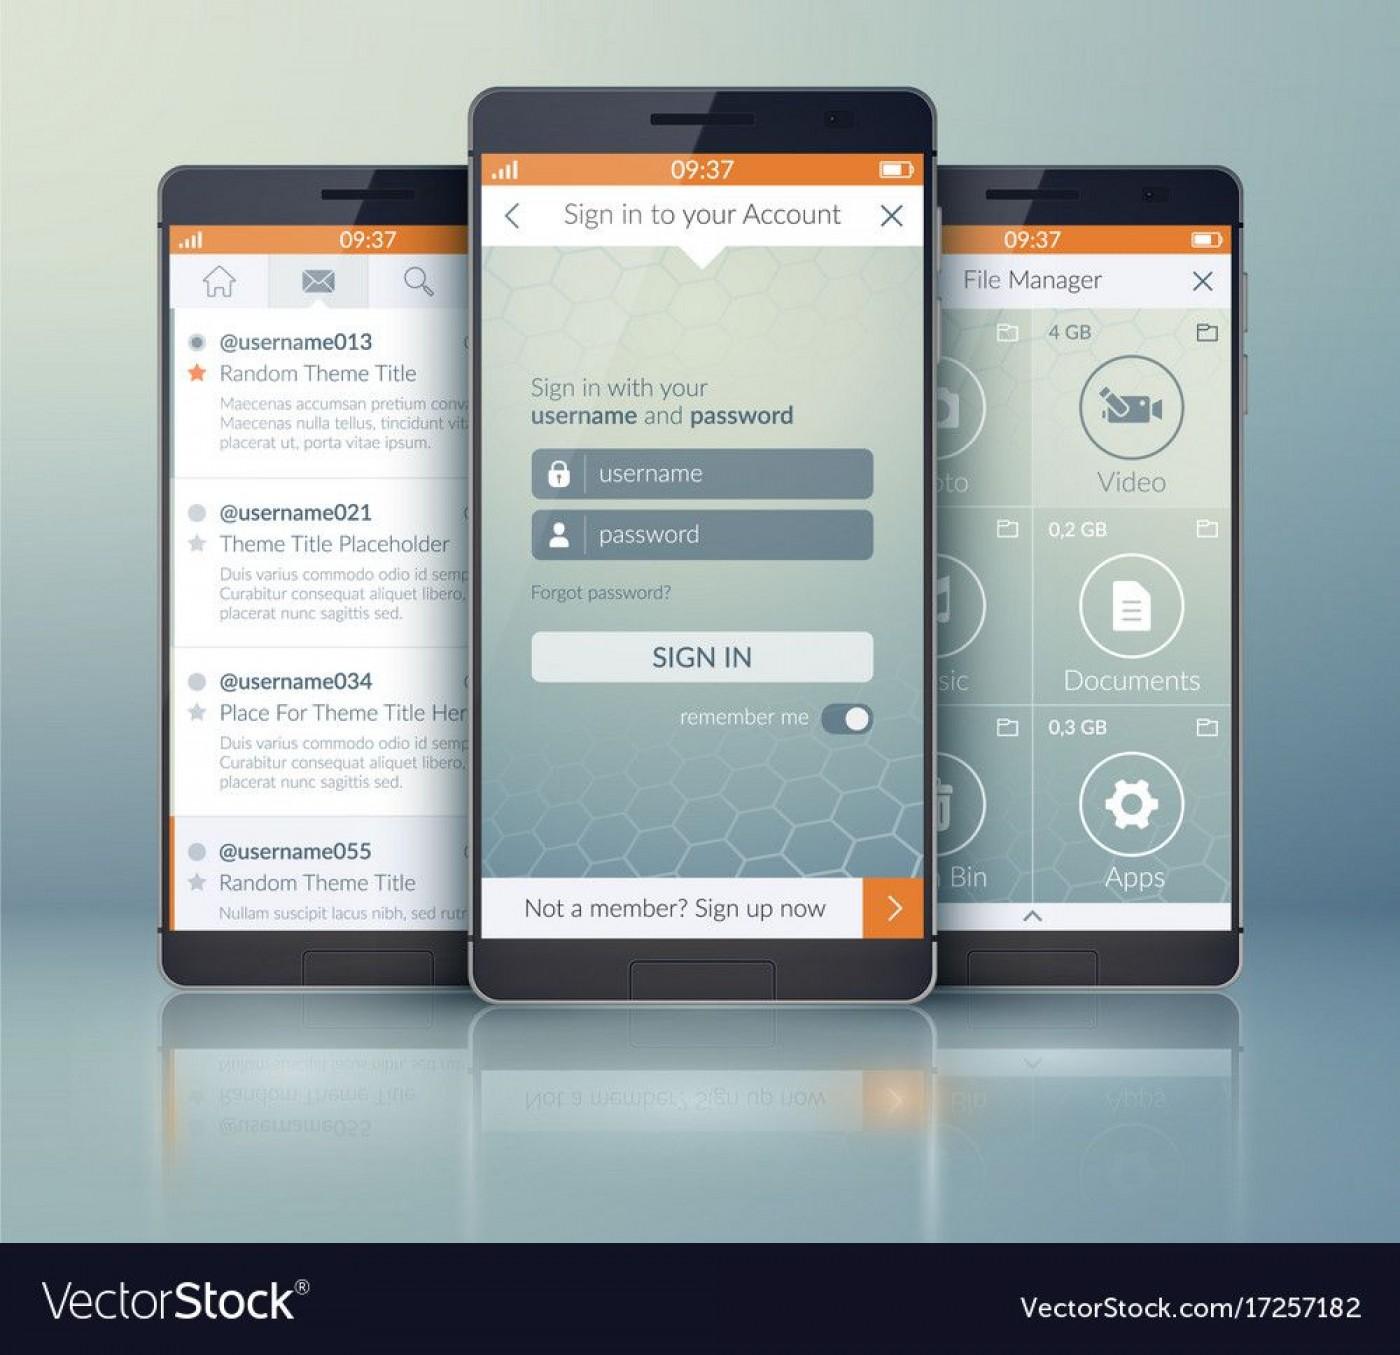 006 Impressive Mobile App Design Template Idea  Size Adobe Xd Ui Psd Free Download1400